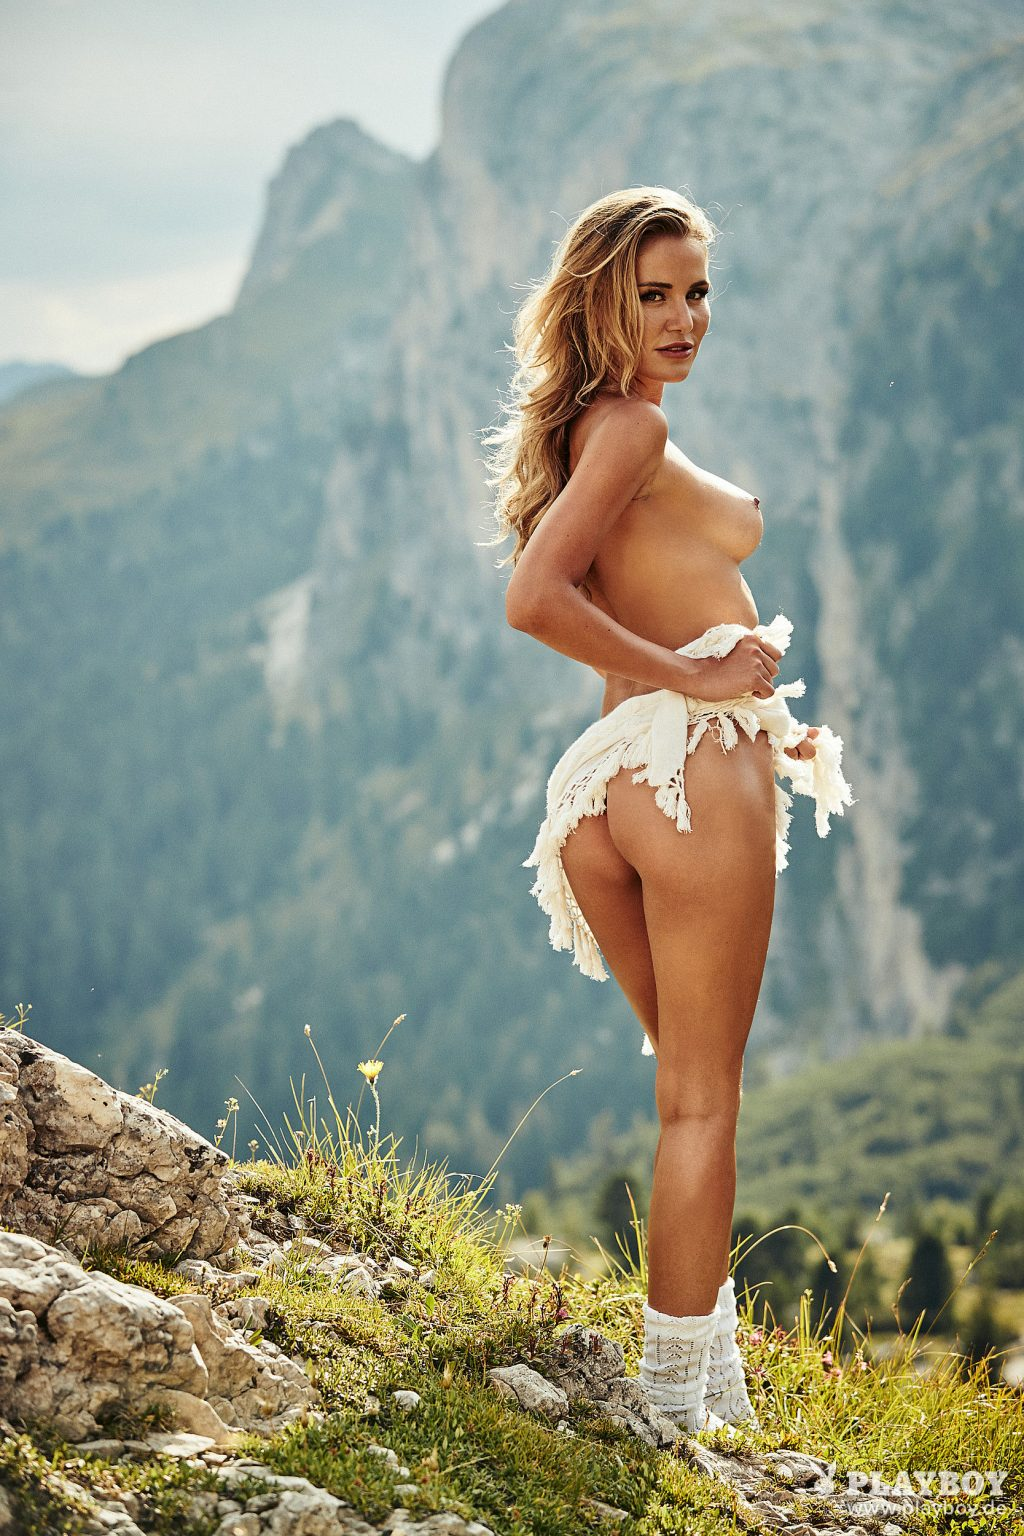 Sexyjulia nackt